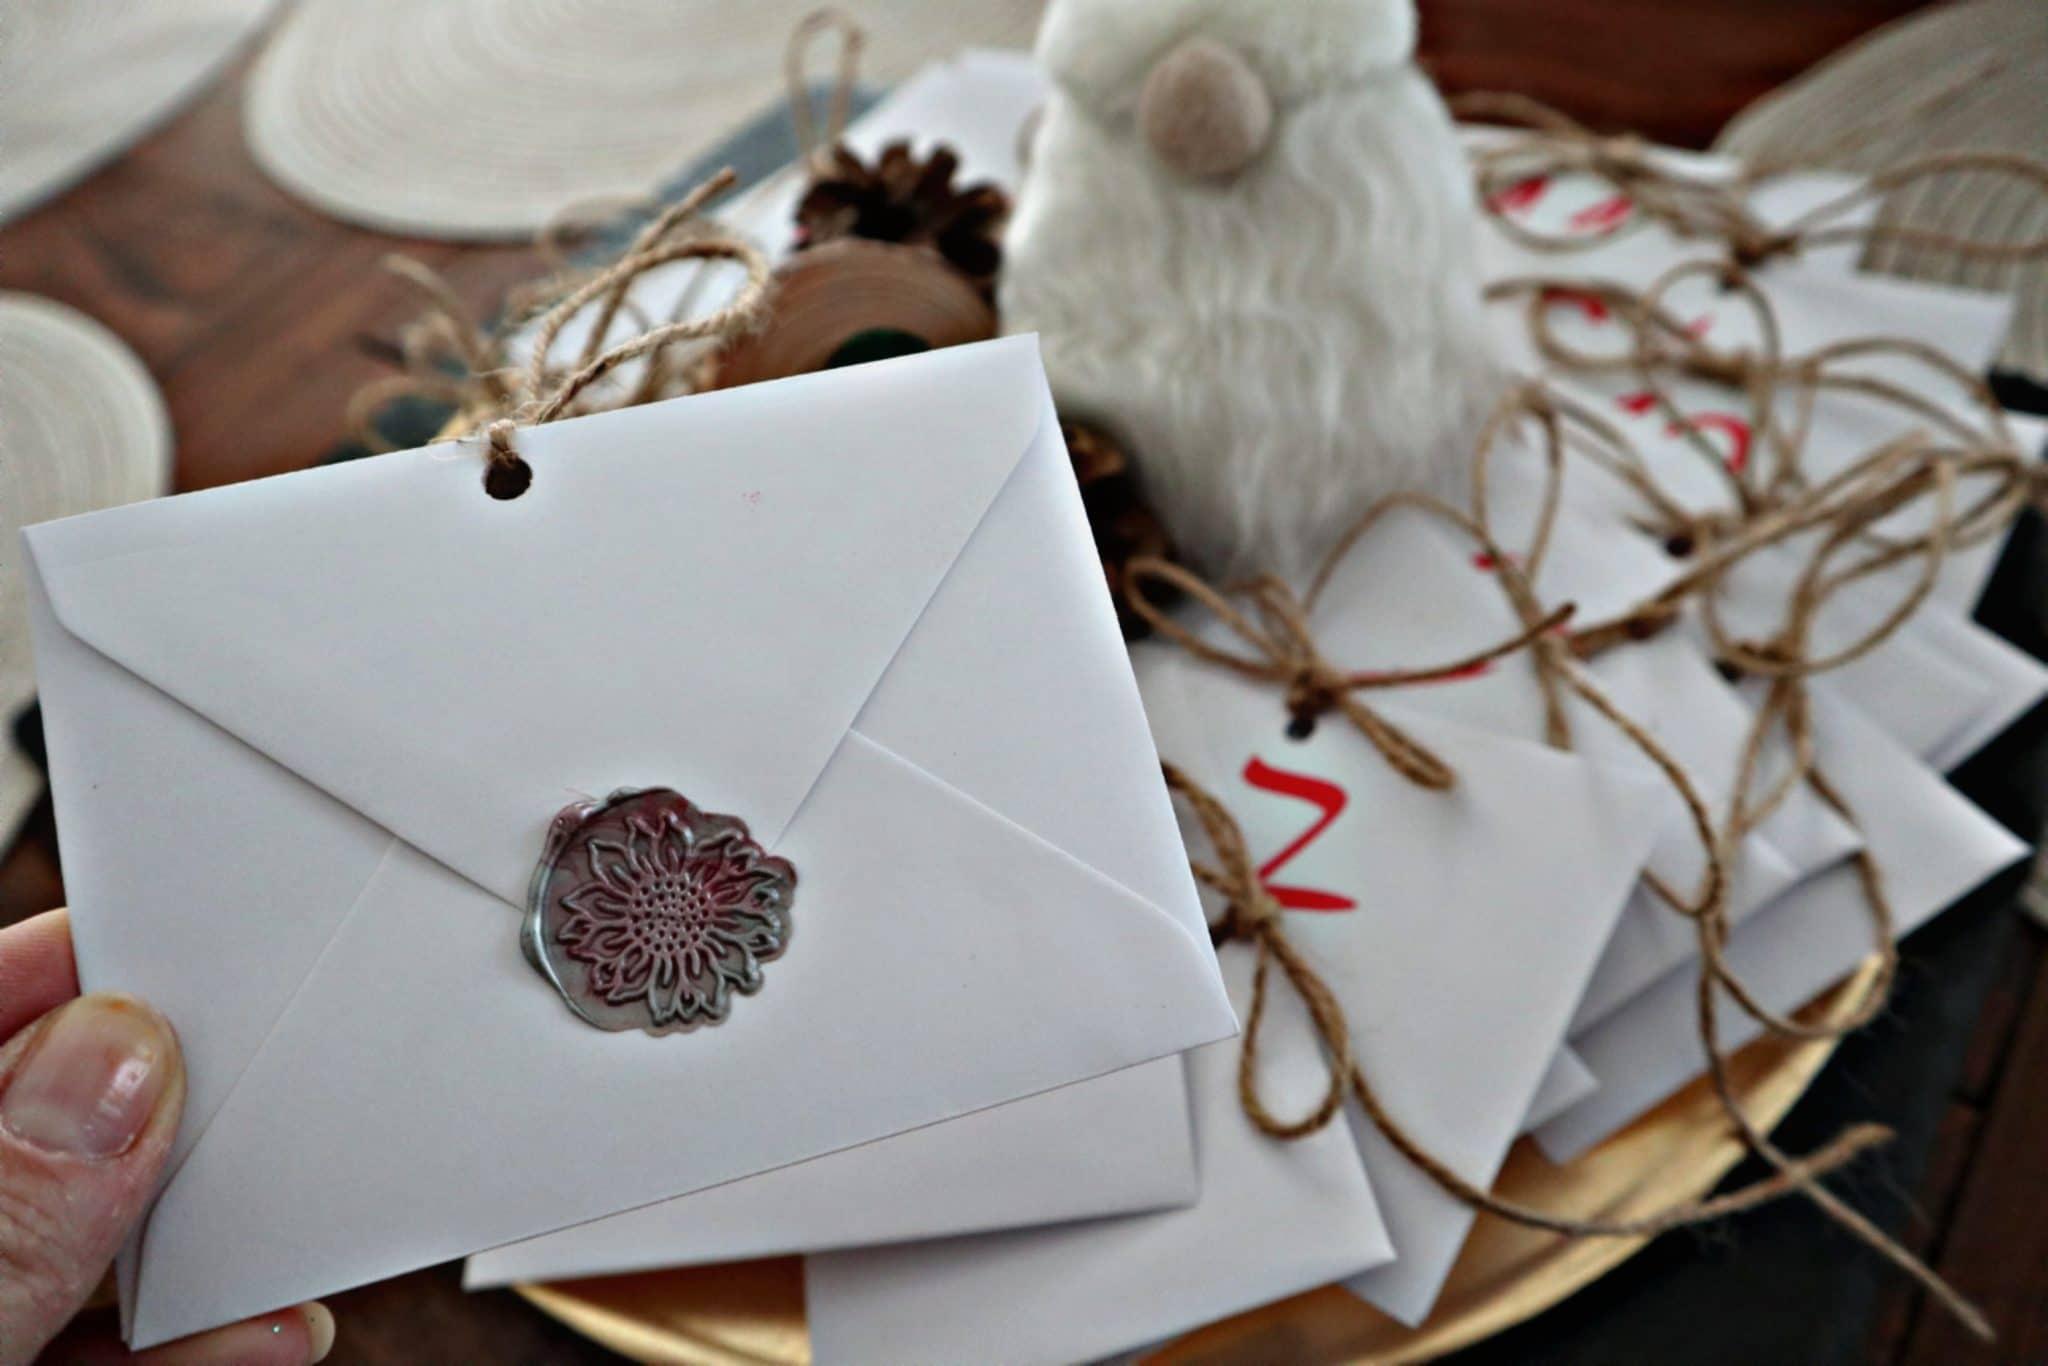 #VikingXmasDIY: Last Minute Familien Adventkalender